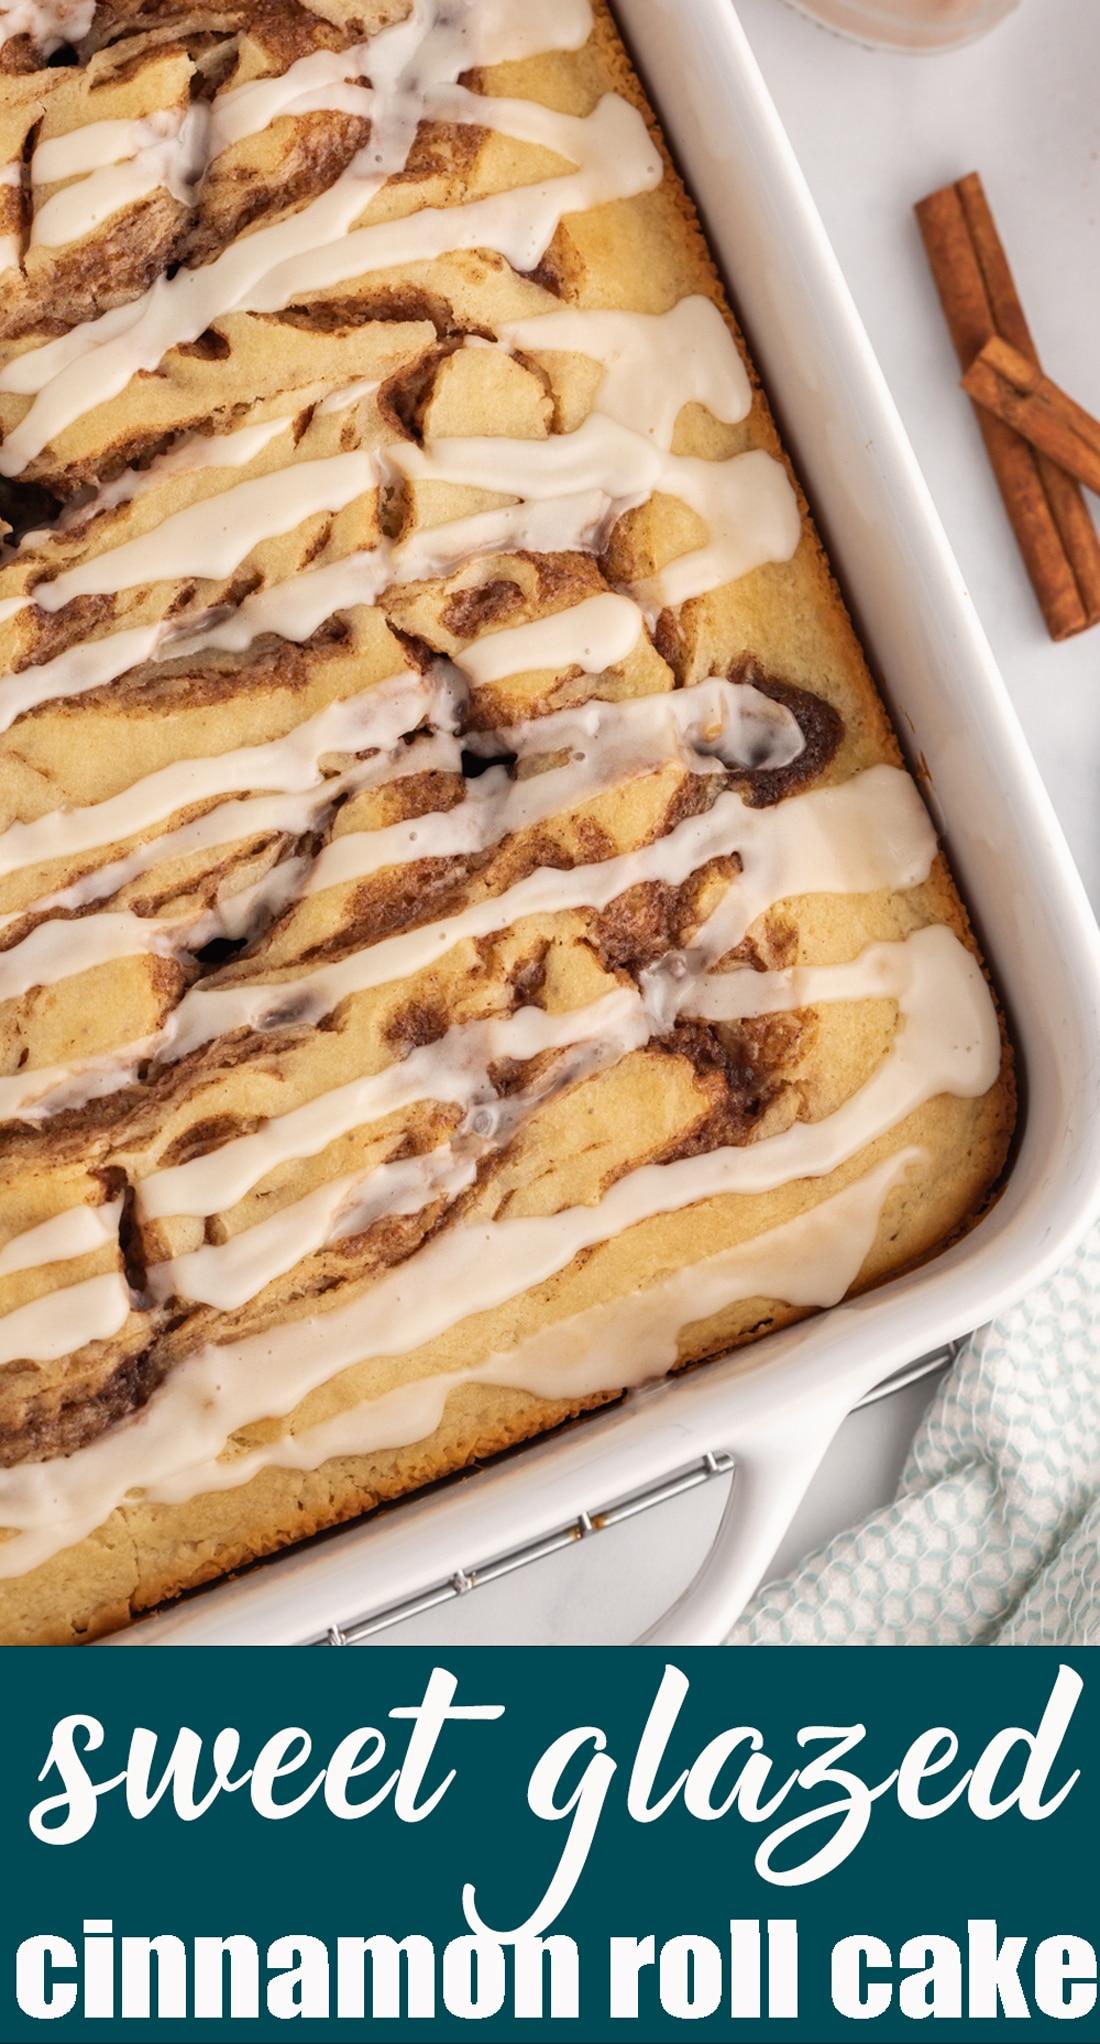 Make an easy coffee cake for breakfast that tastes just like a soft sweet roll! This Cinnamon Roll Cake has a cinnamon sugar swirl and is topped with cream glaze. #cake #breakfast #cinnamonroll via @tastesoflizzyt